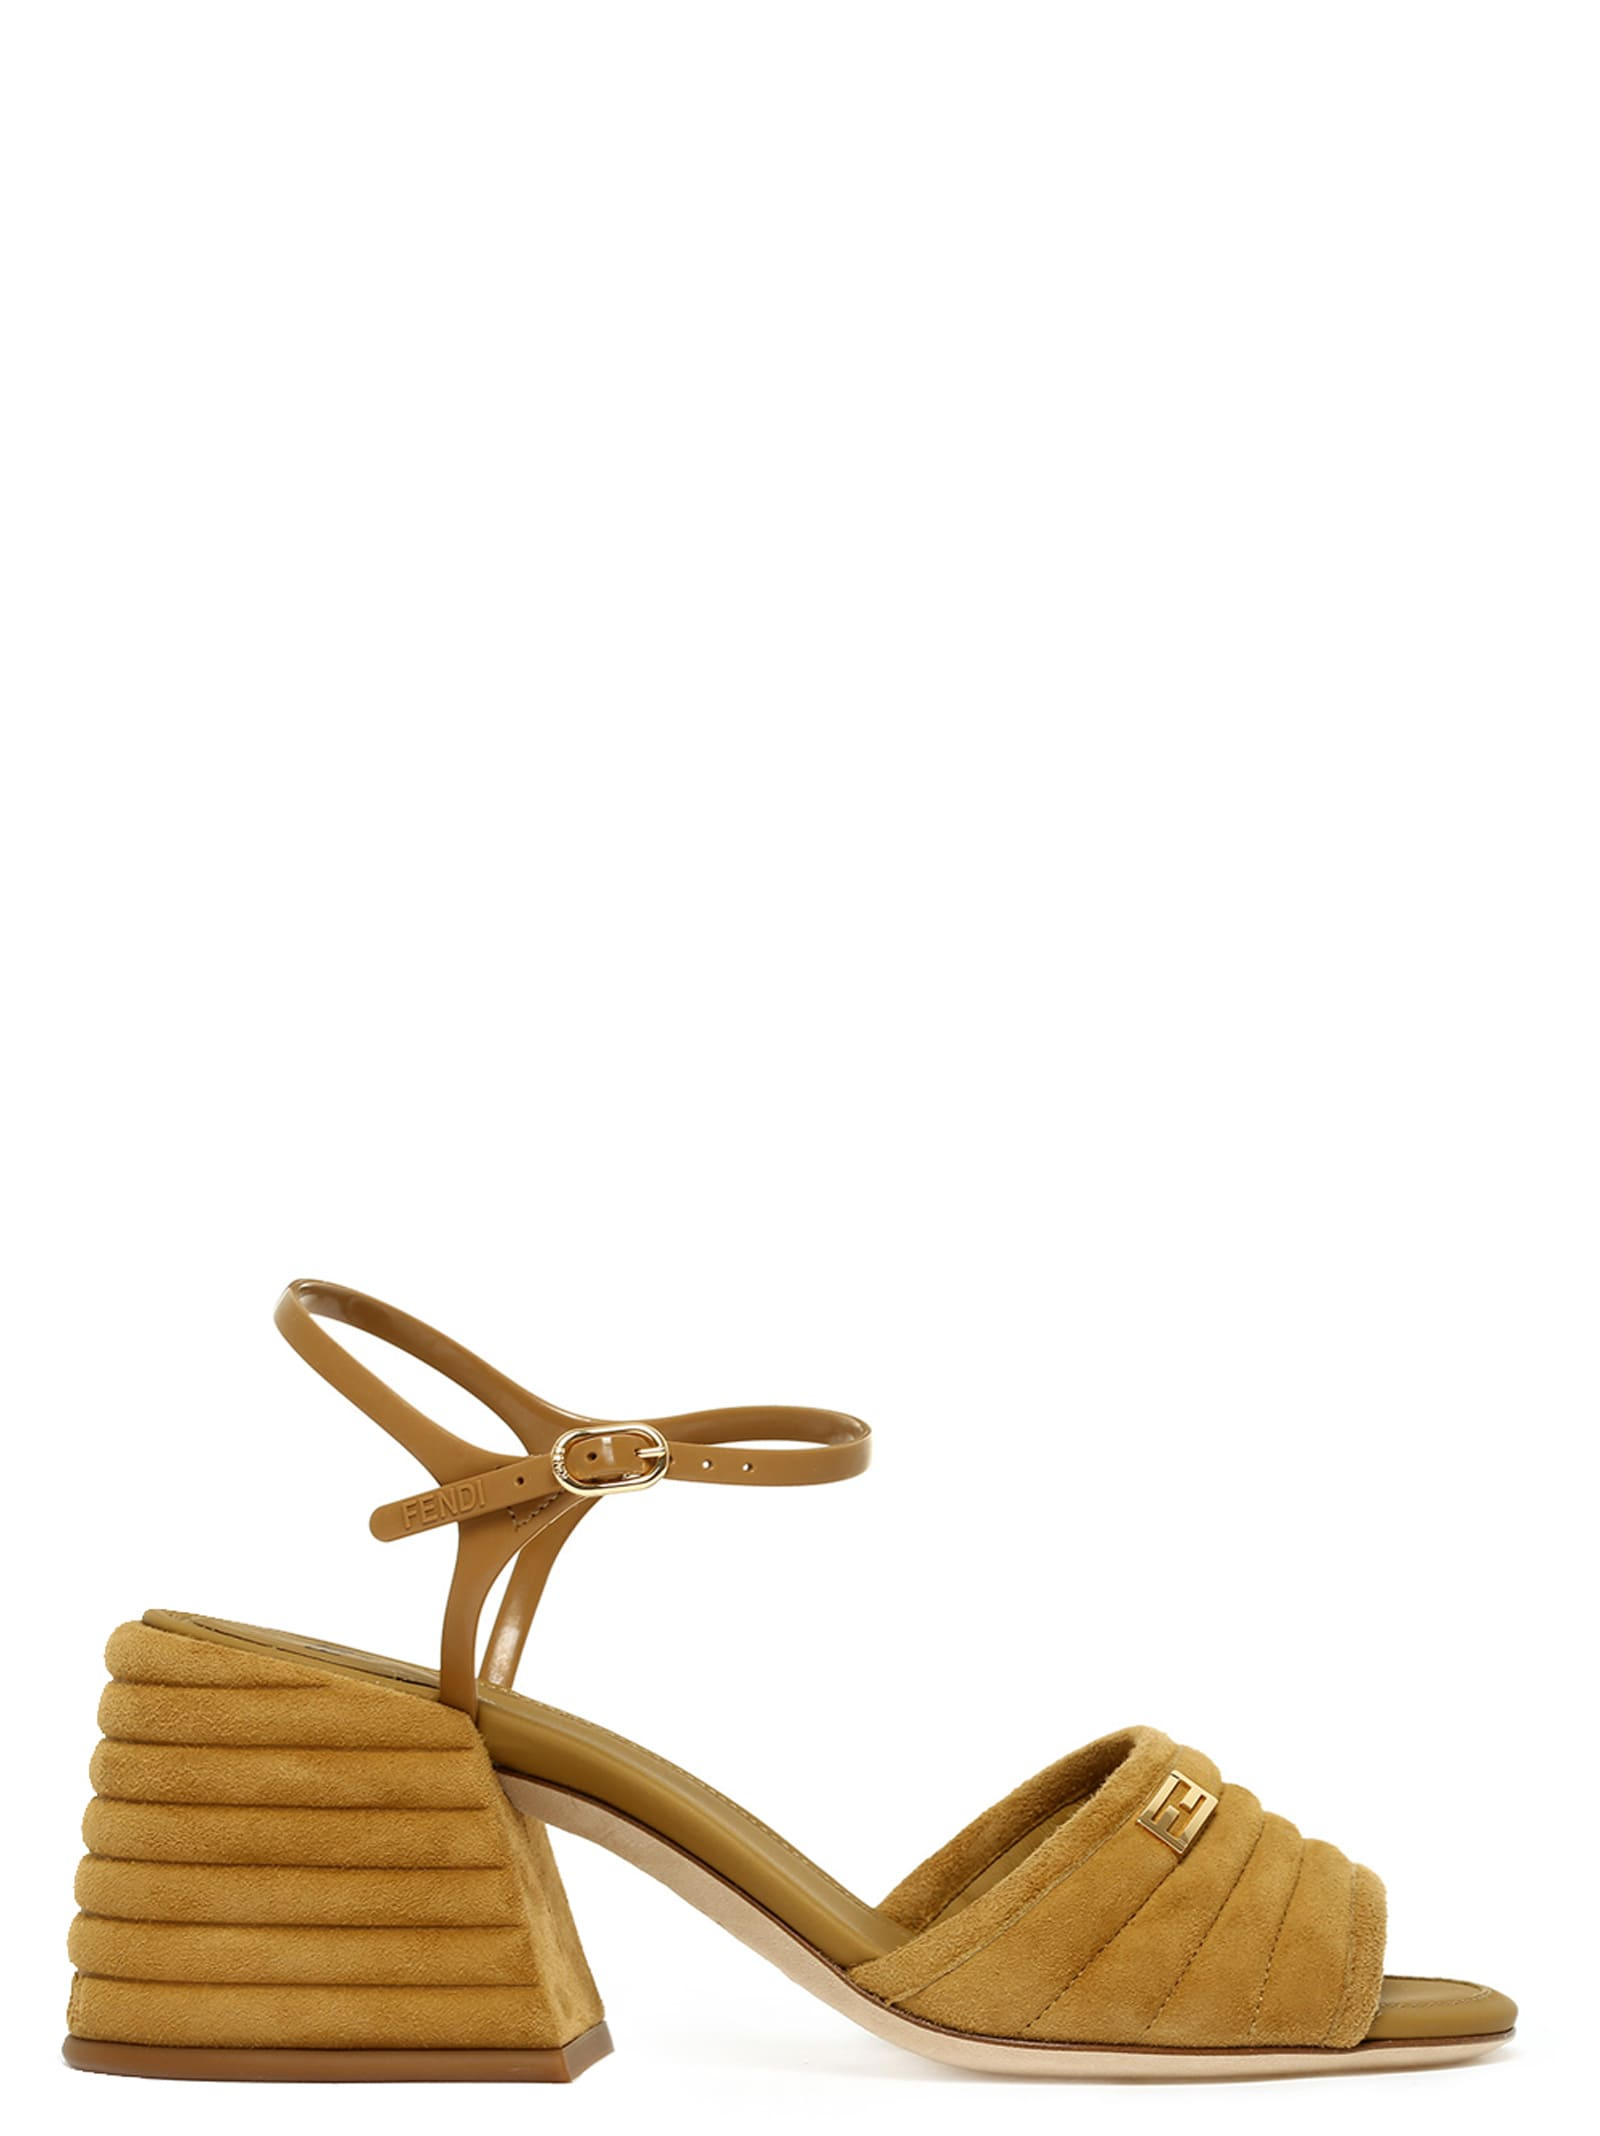 Fendi promenade Shoes